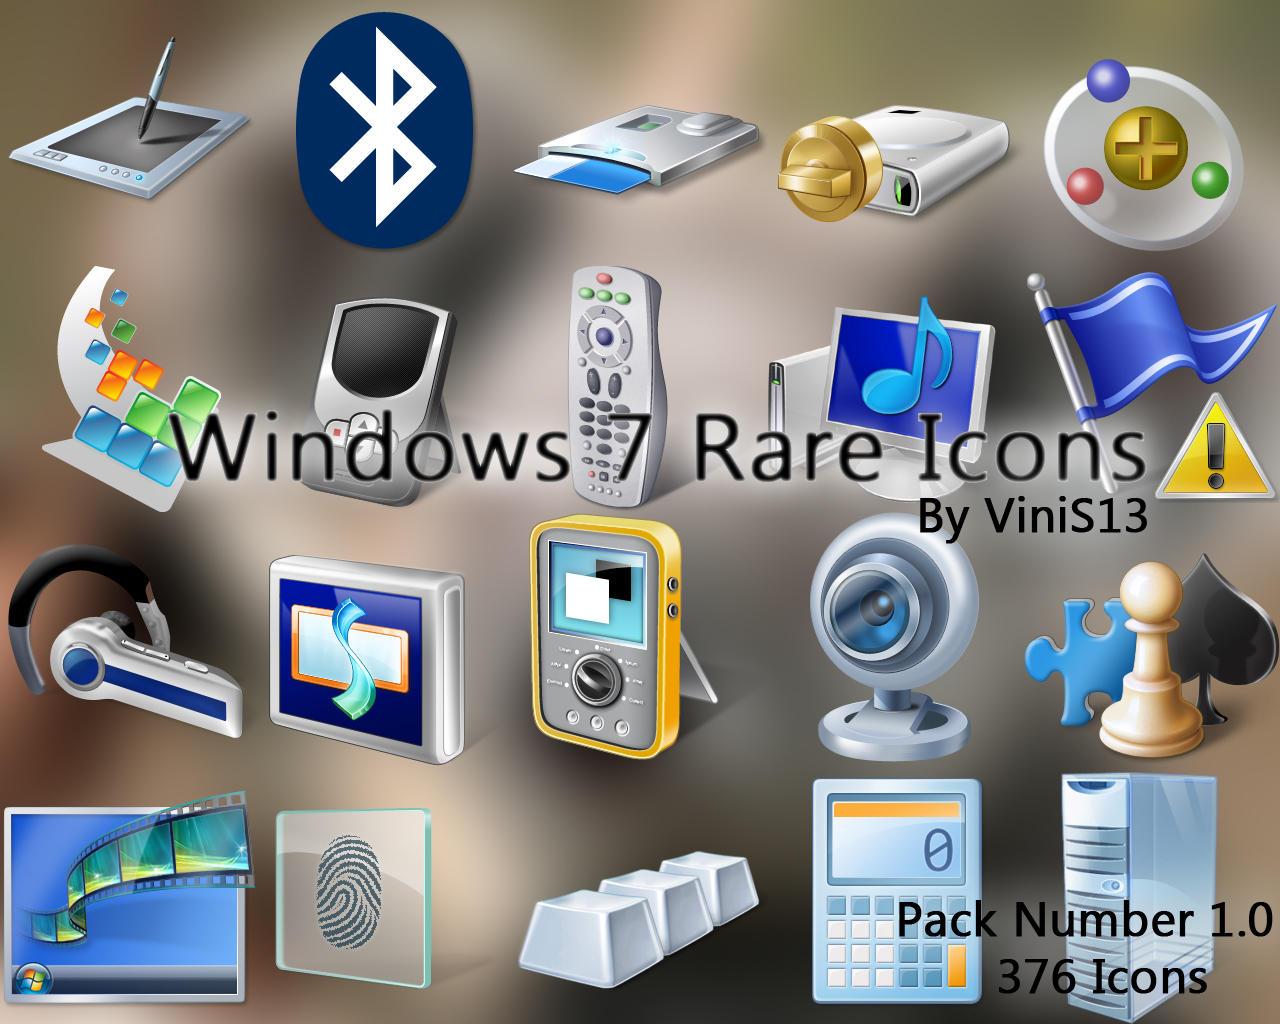 Windows 7 Rare Icons by Vinis13